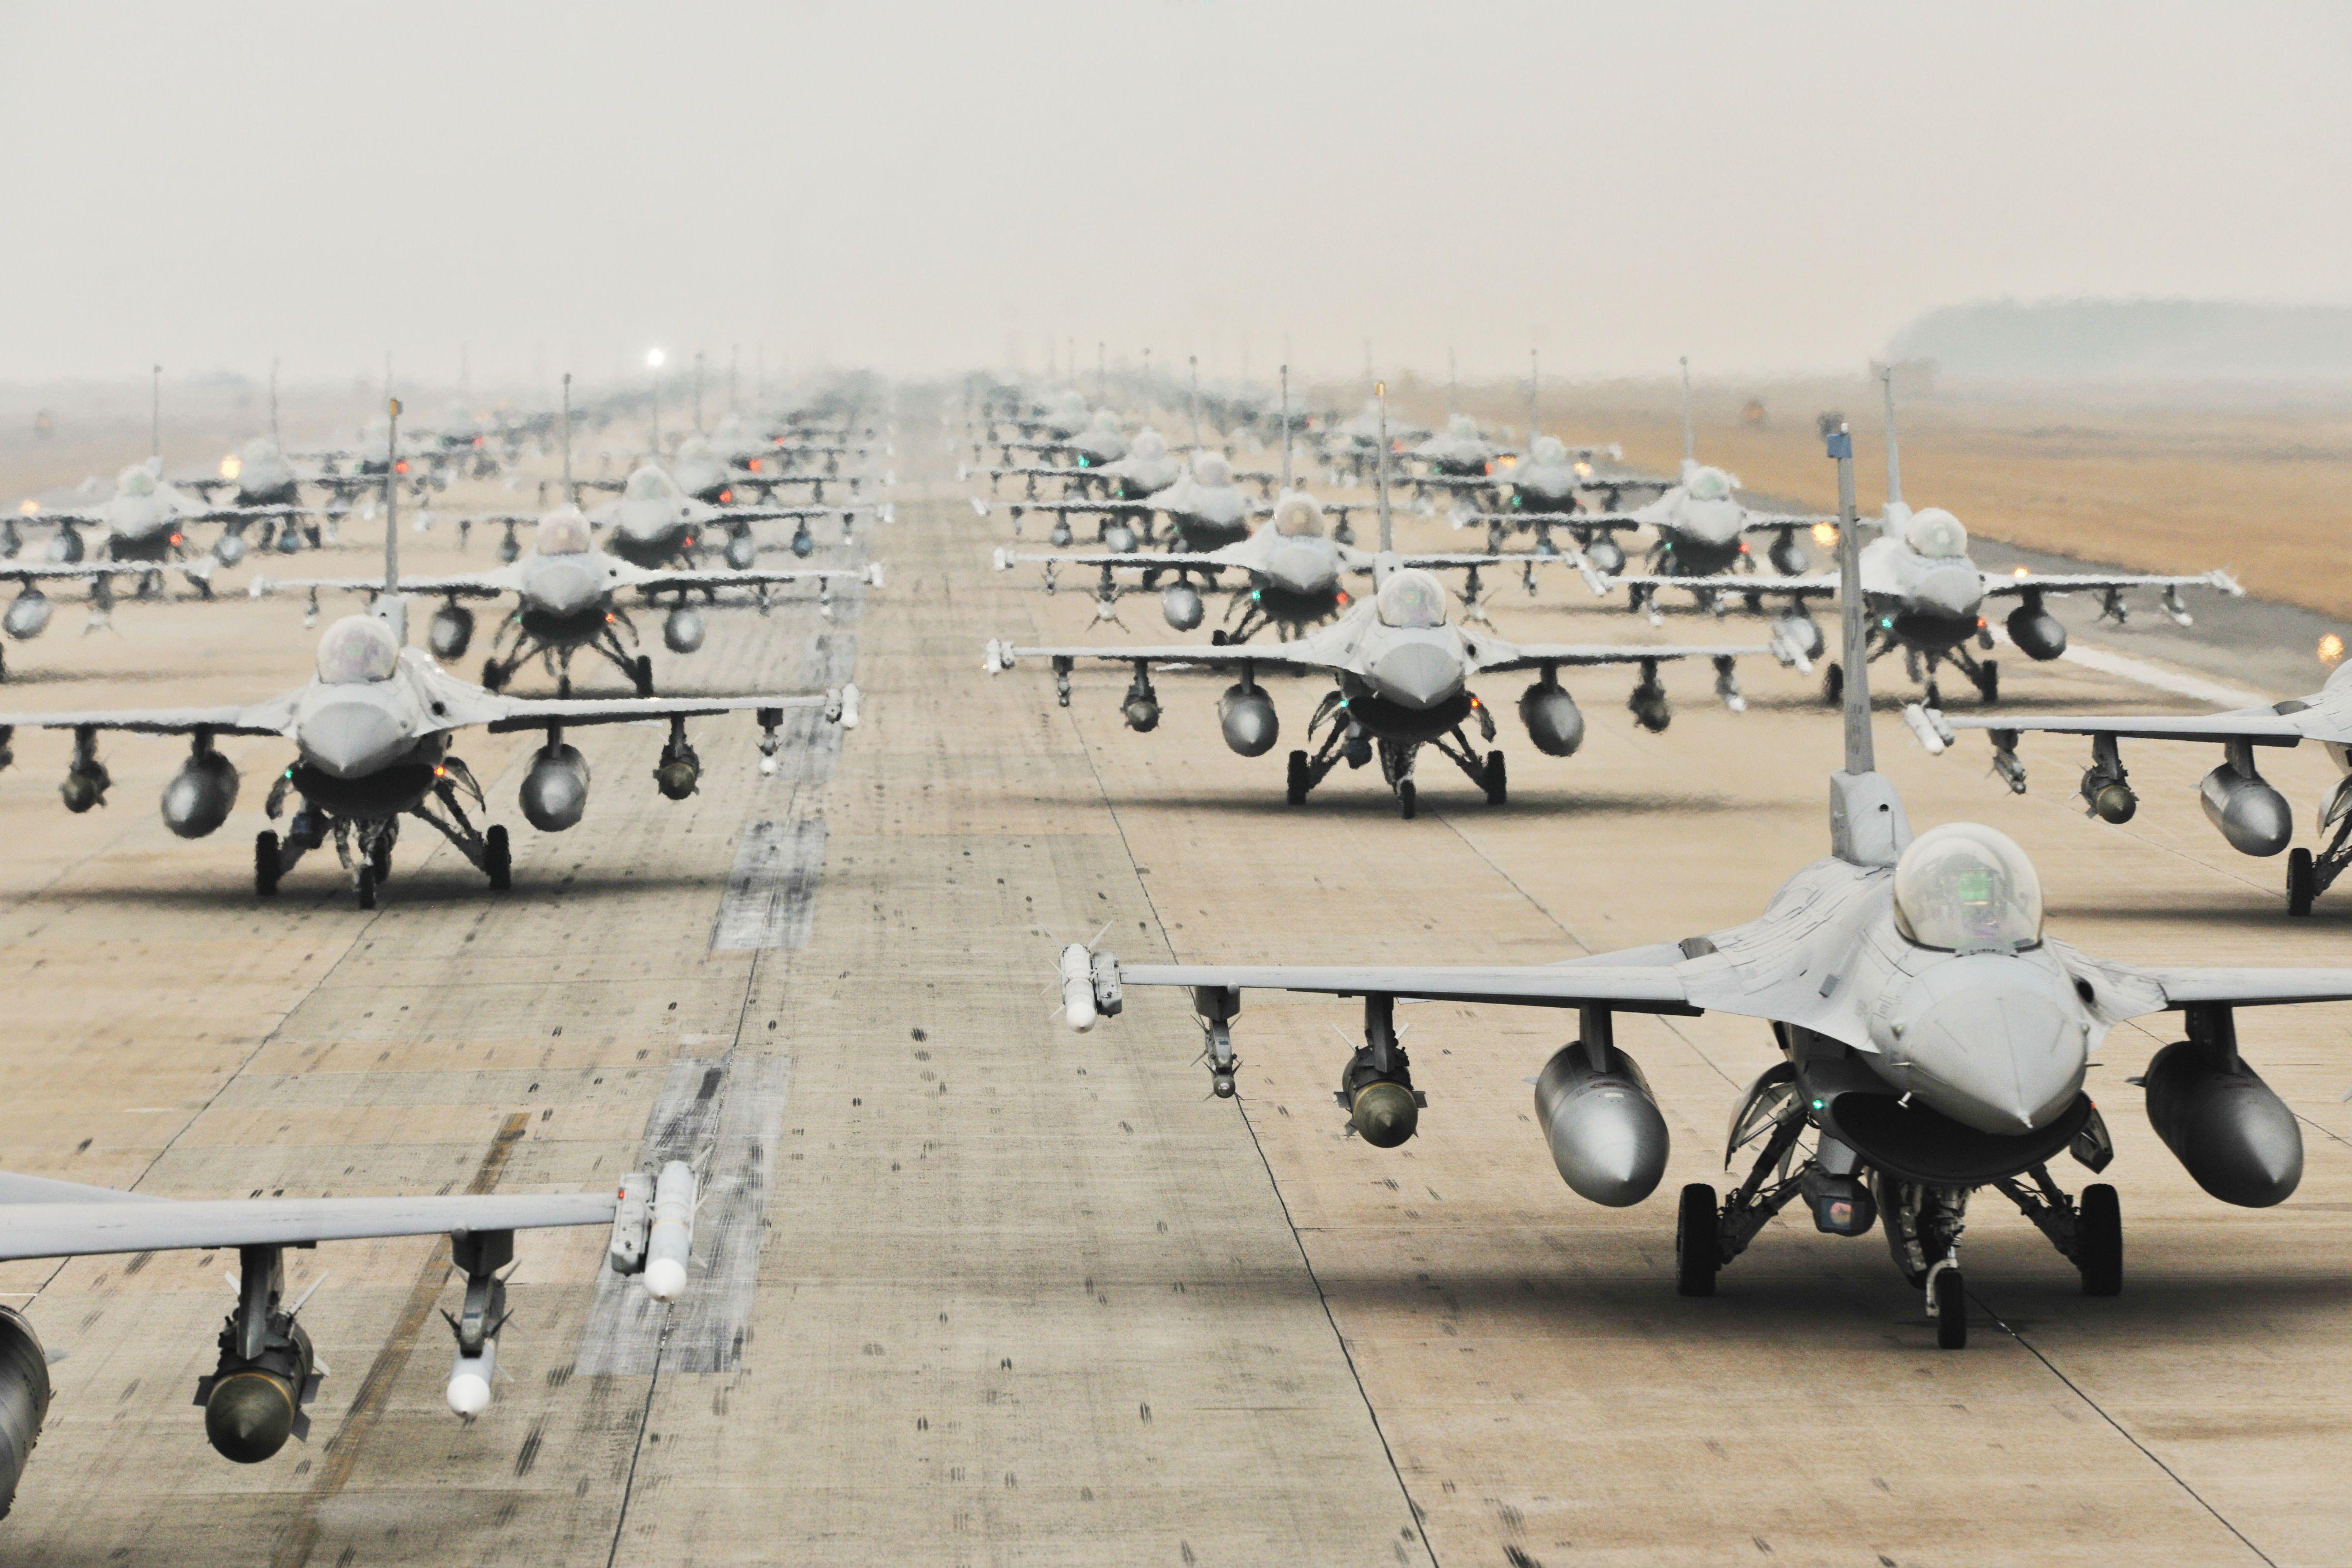 Pin De Bryce W En Dc Aviones De Combate Fuerza Aerea Paises Arabes